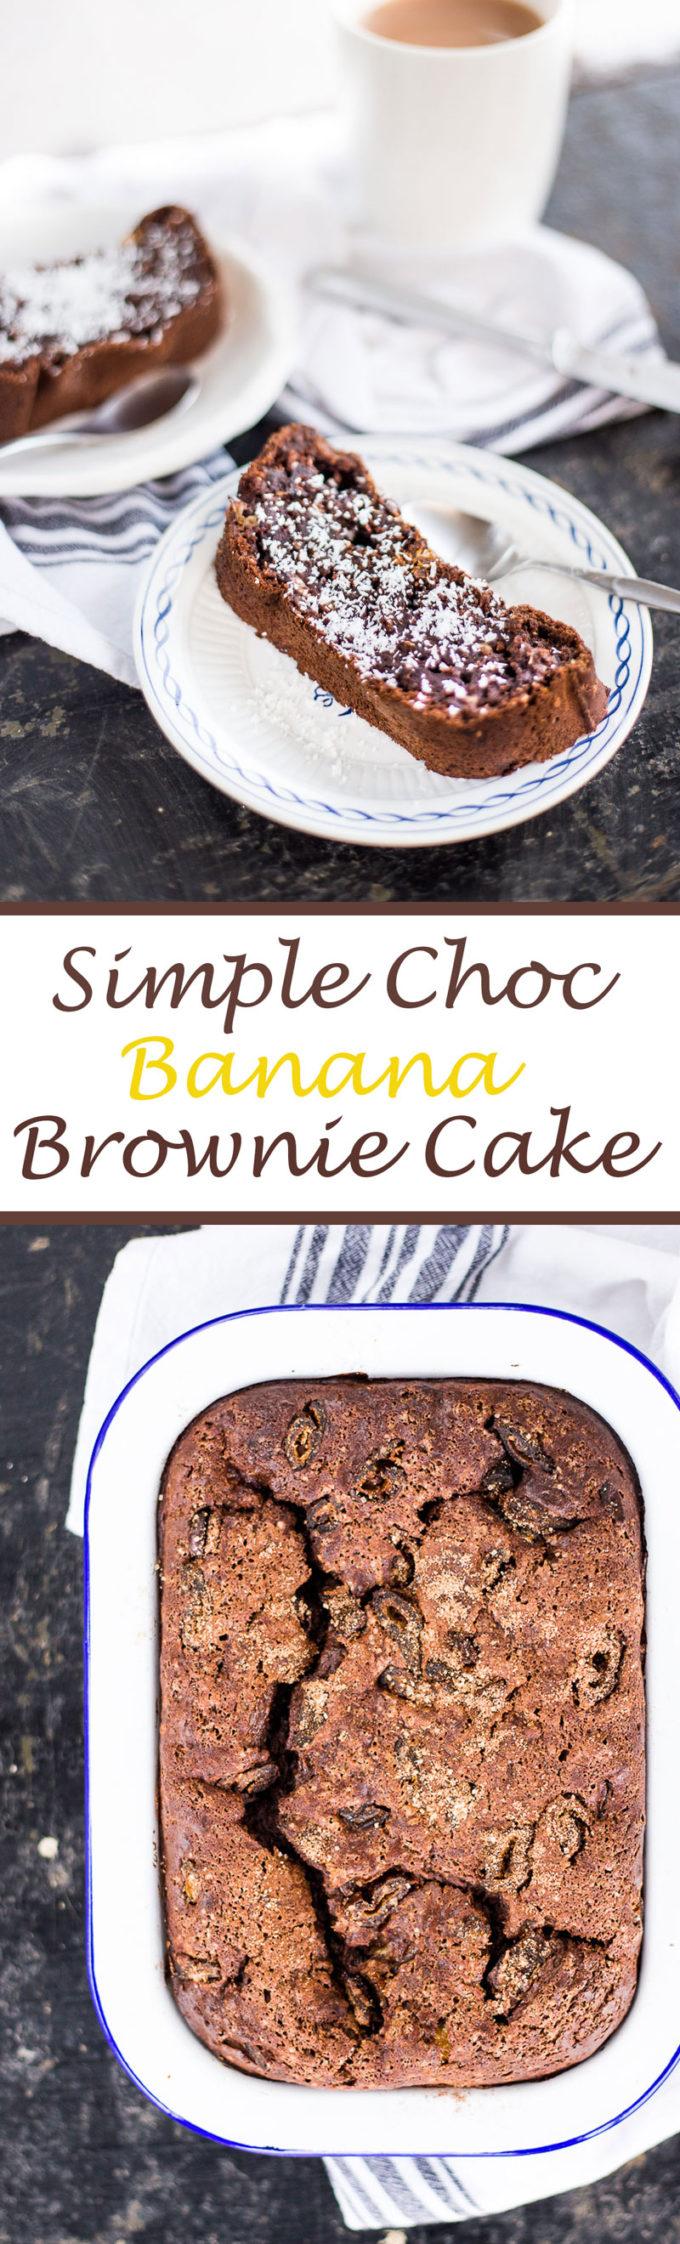 Super Simple Choc Banana Brownie Cake